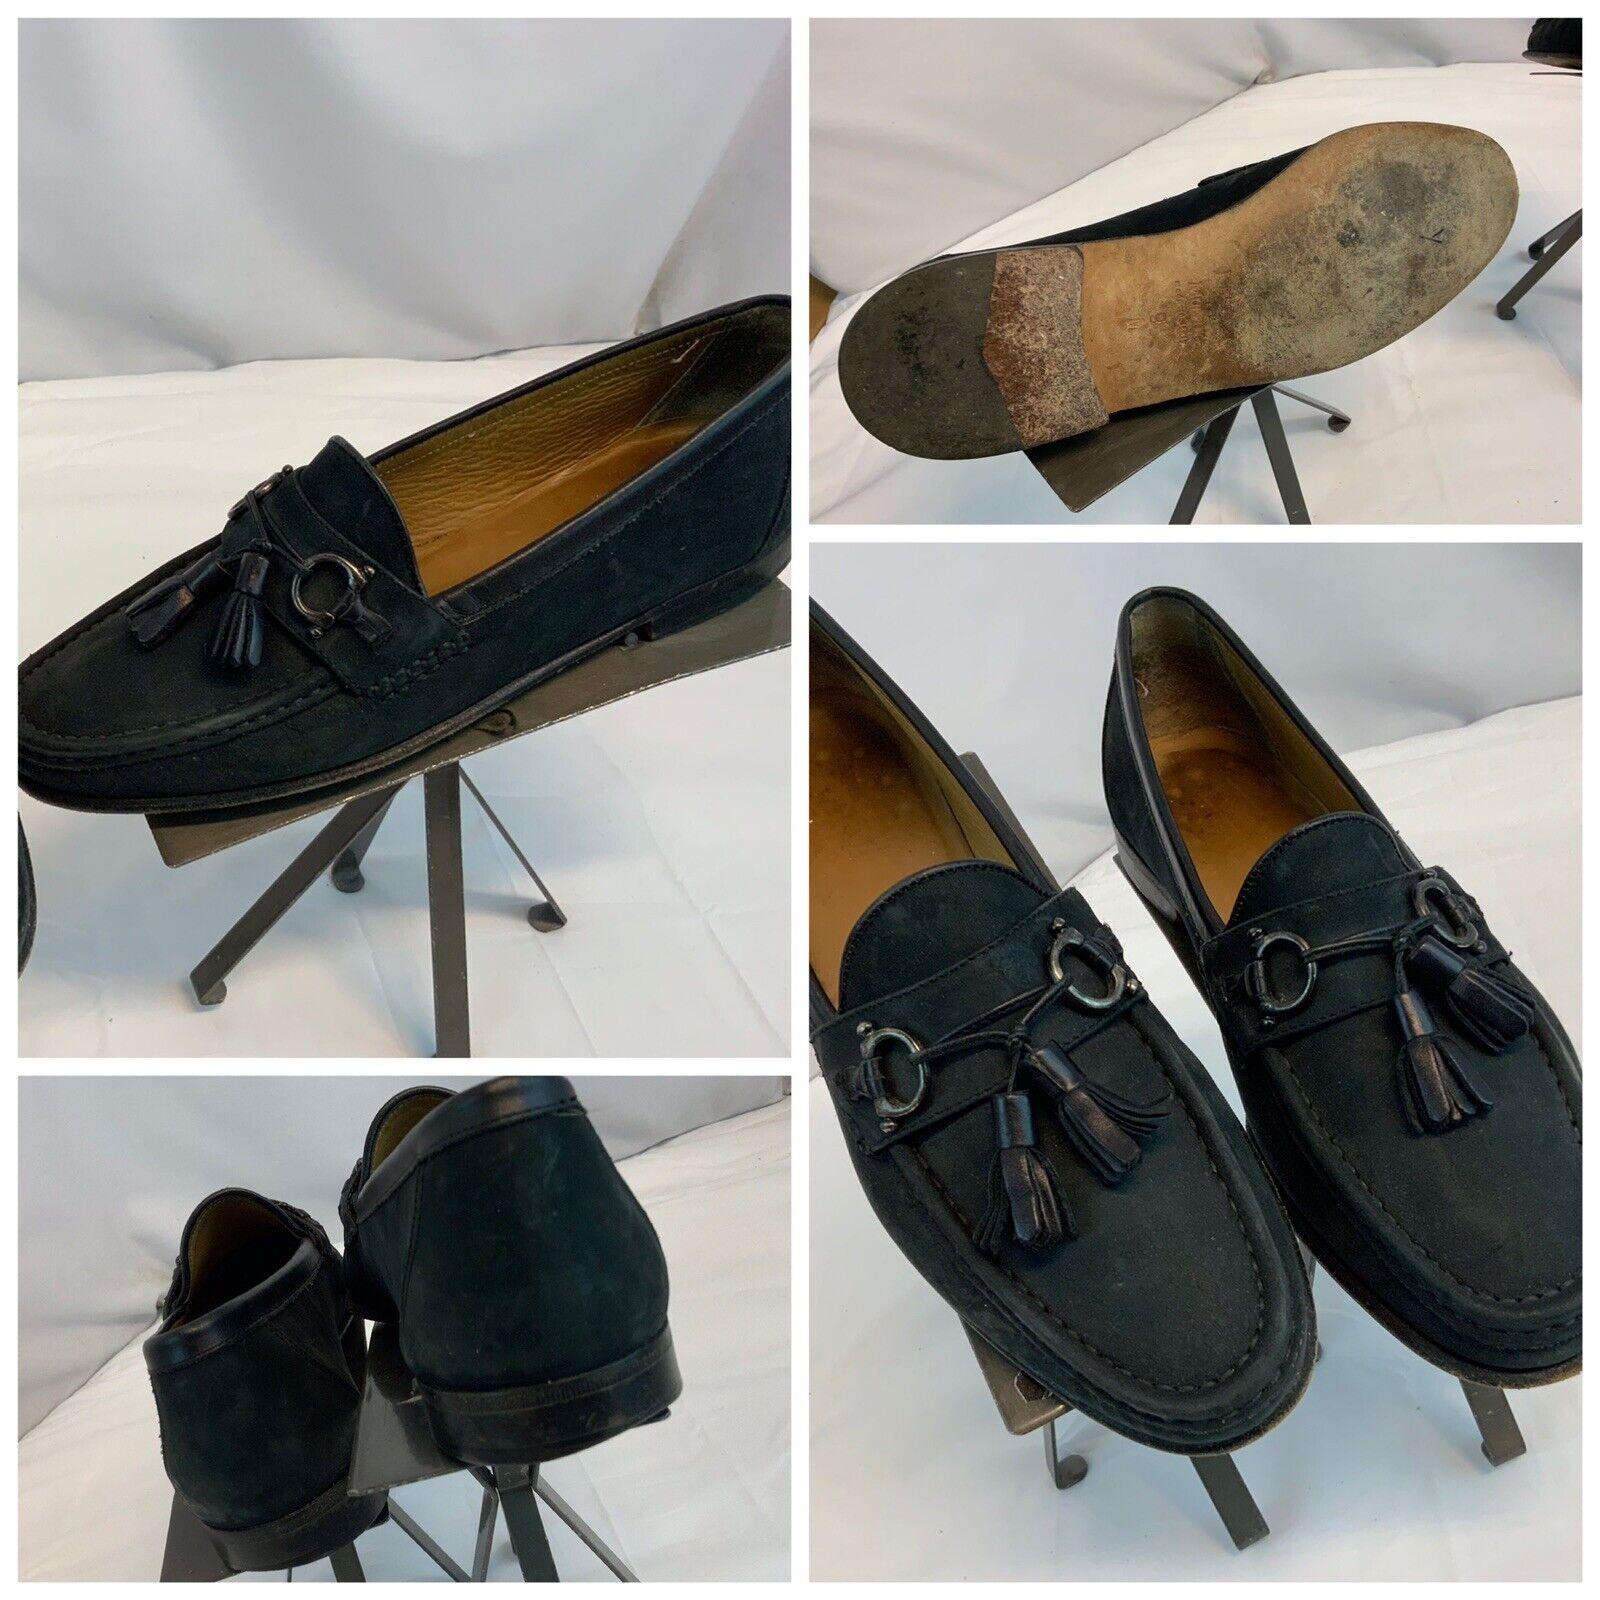 Johnston Murphy Domani Tassel Loafers Shoes Sz 9 Men Black Italy YGI H0S-42